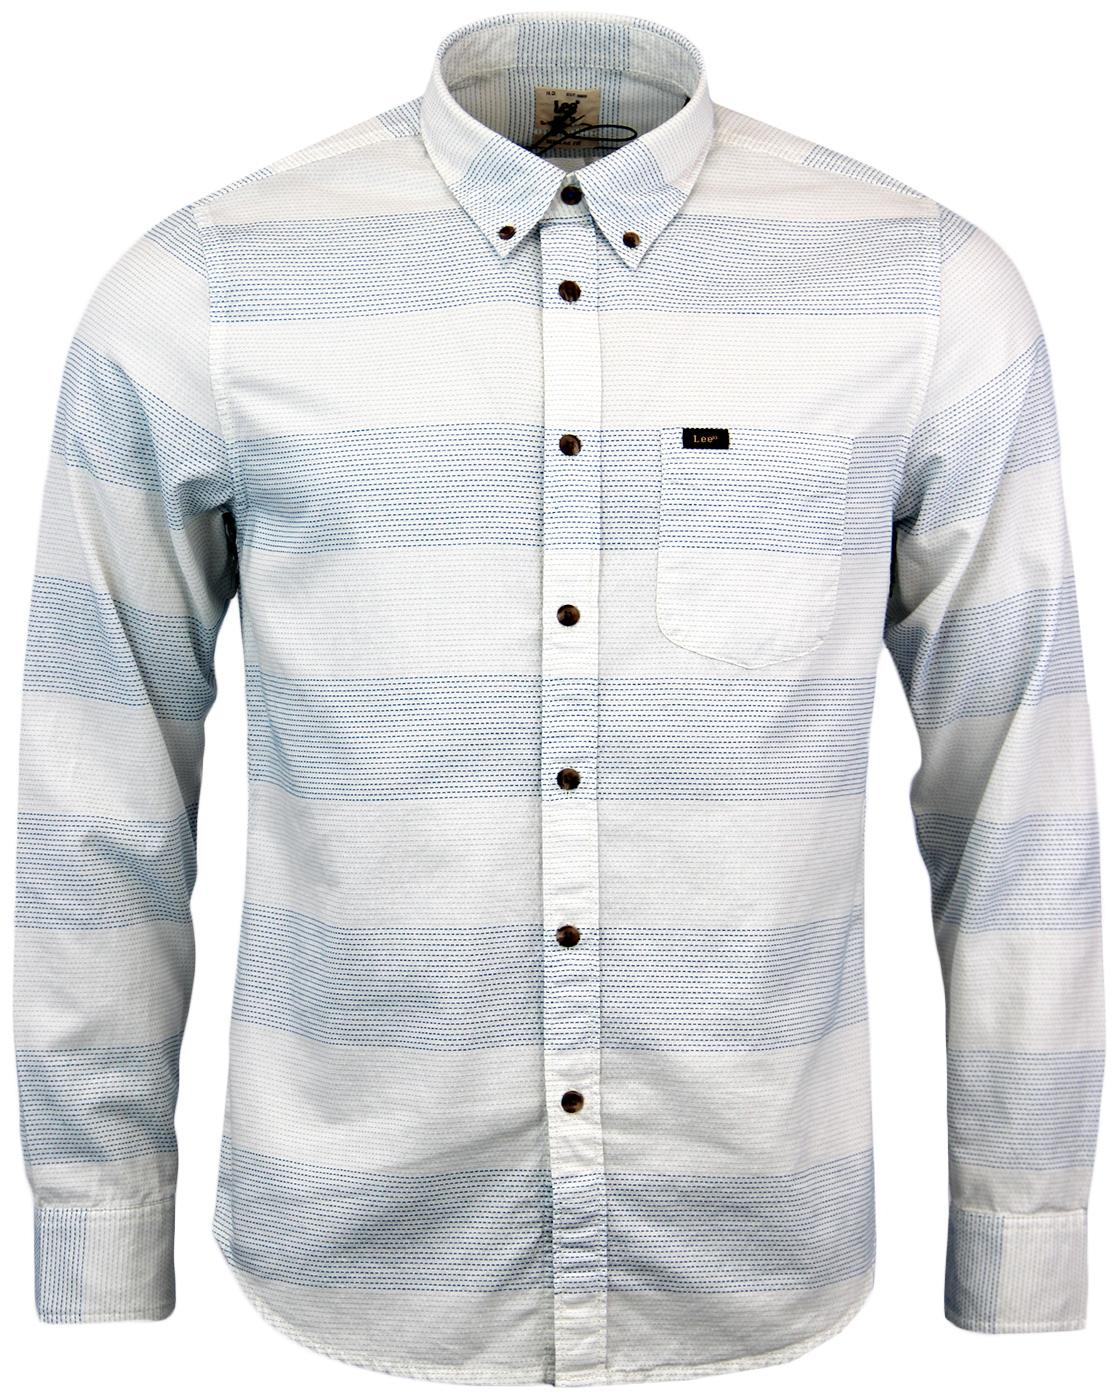 LEE Retro Mod Button Down Cloud Dancer Shirt W/B